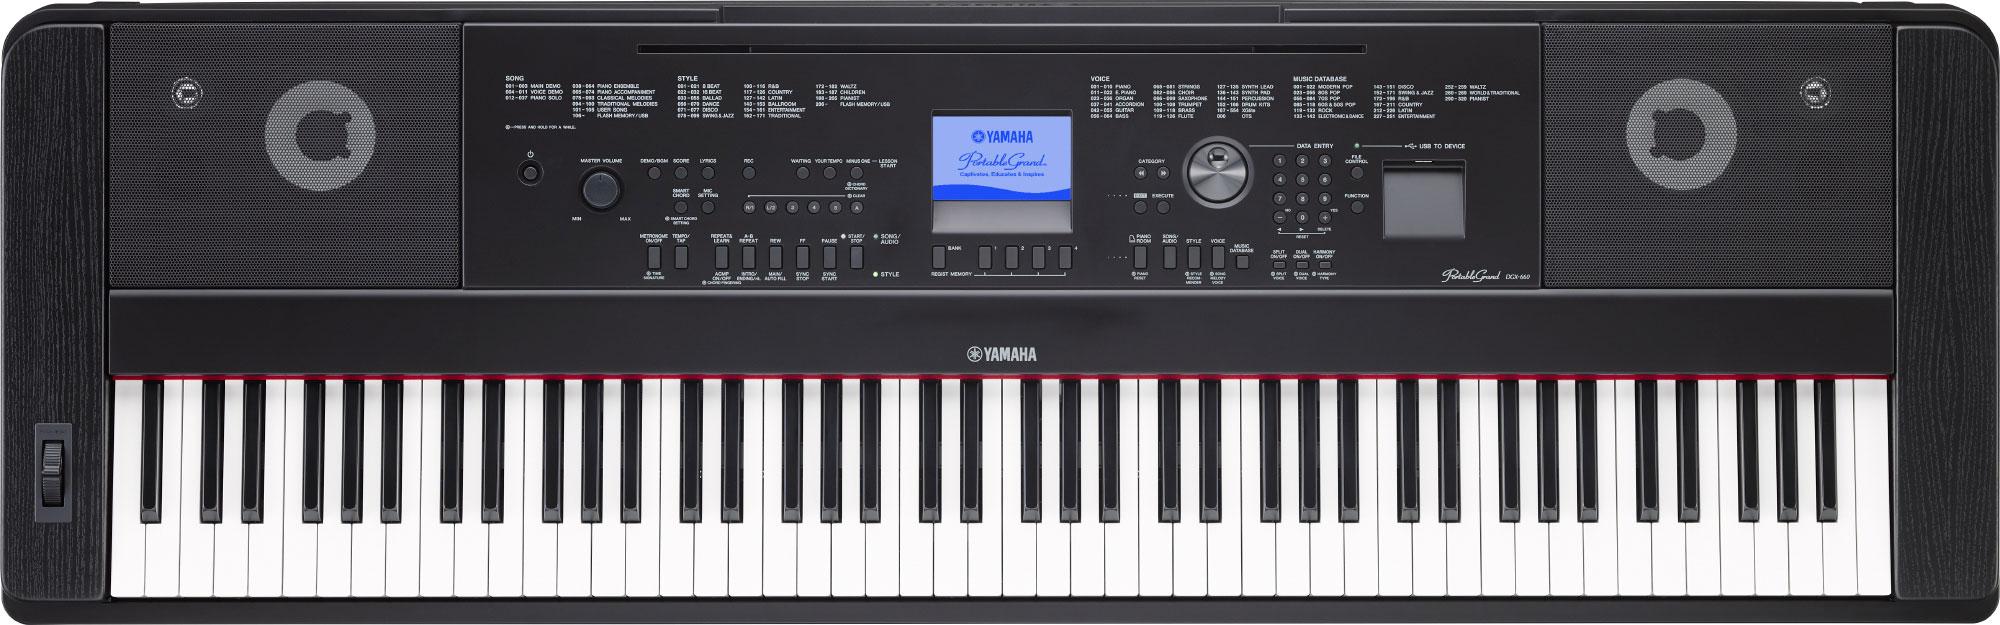 yamaha dgx 660 digital piano in black finish with stand yamaha music london. Black Bedroom Furniture Sets. Home Design Ideas